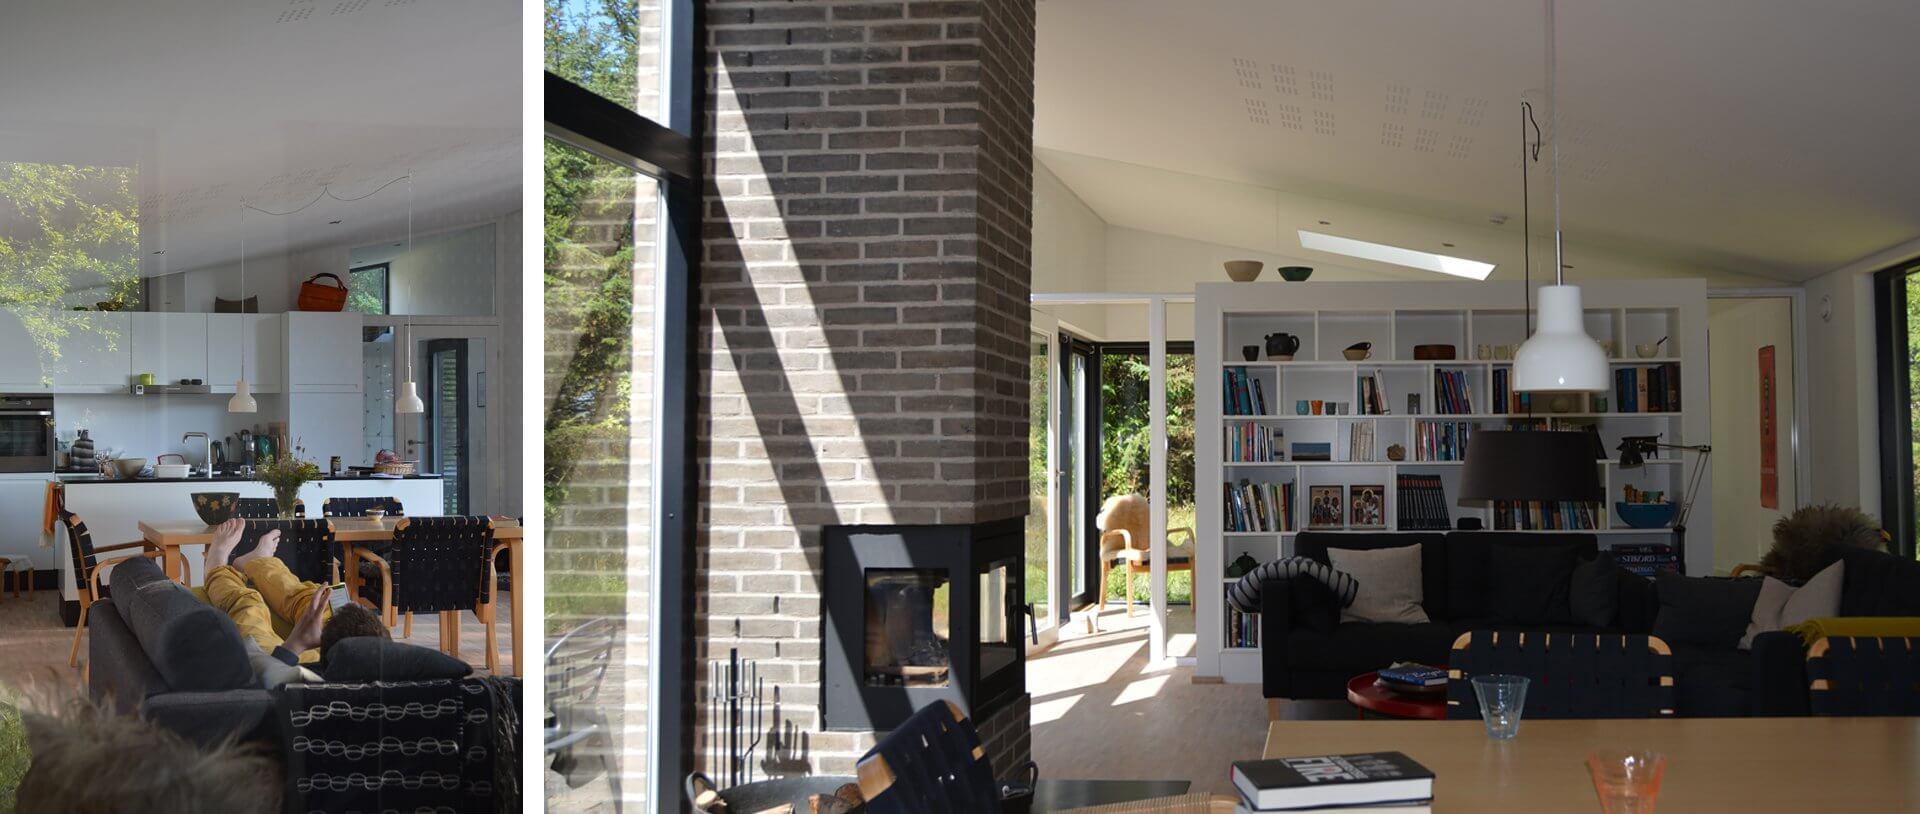 Sommerhus Rubjerg Knude